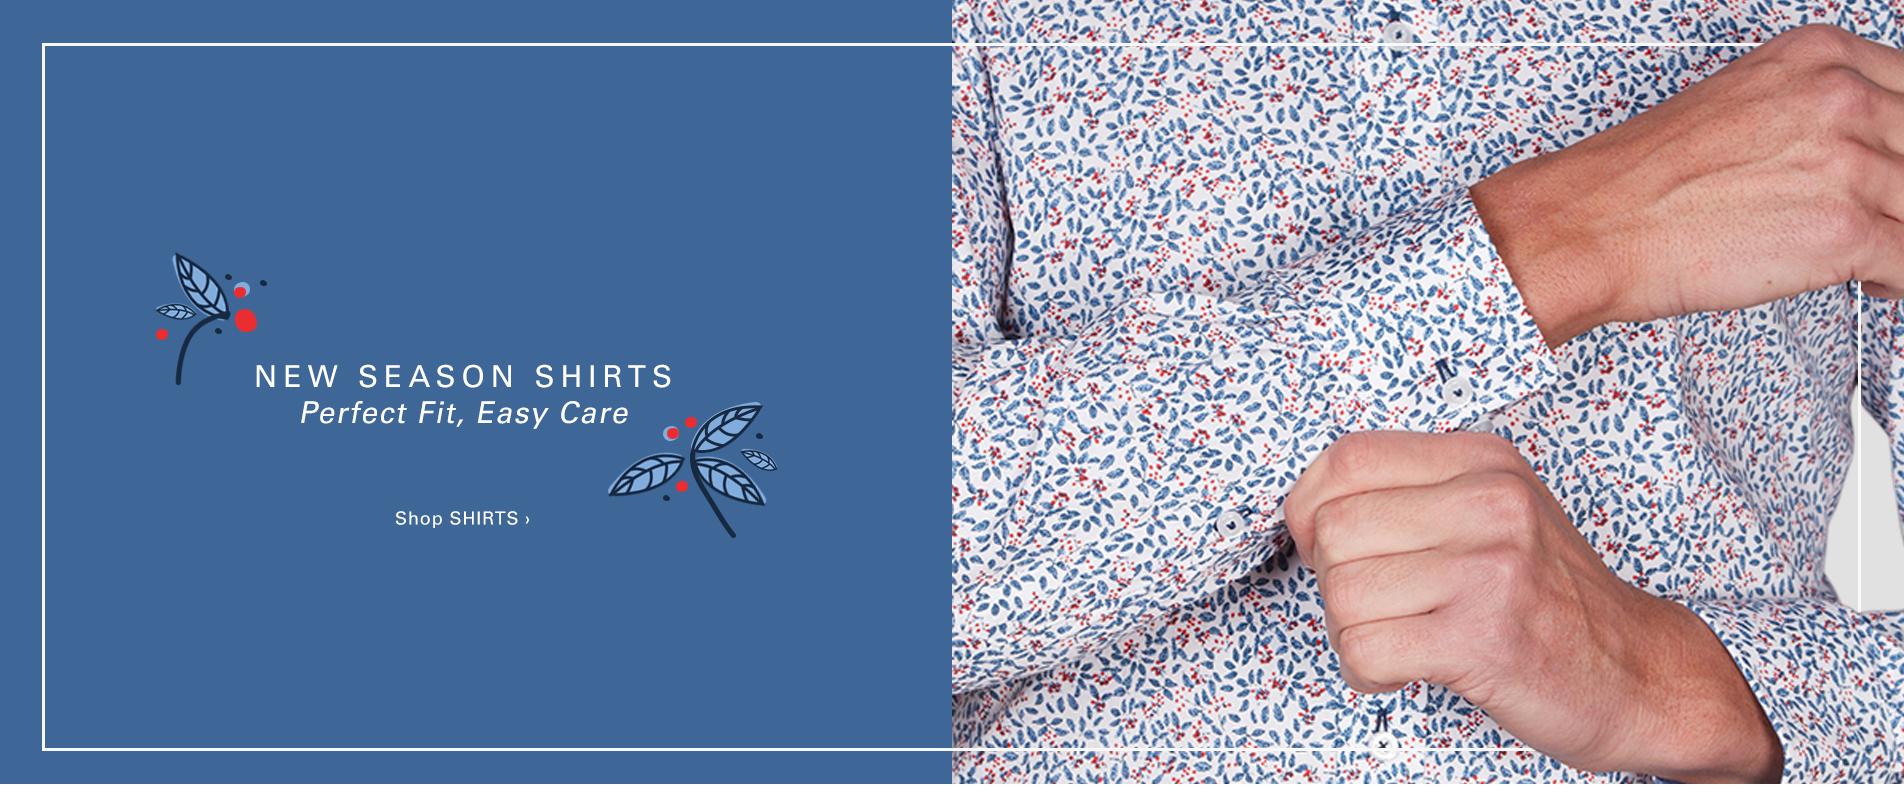 New Season Shirts | Shop Now